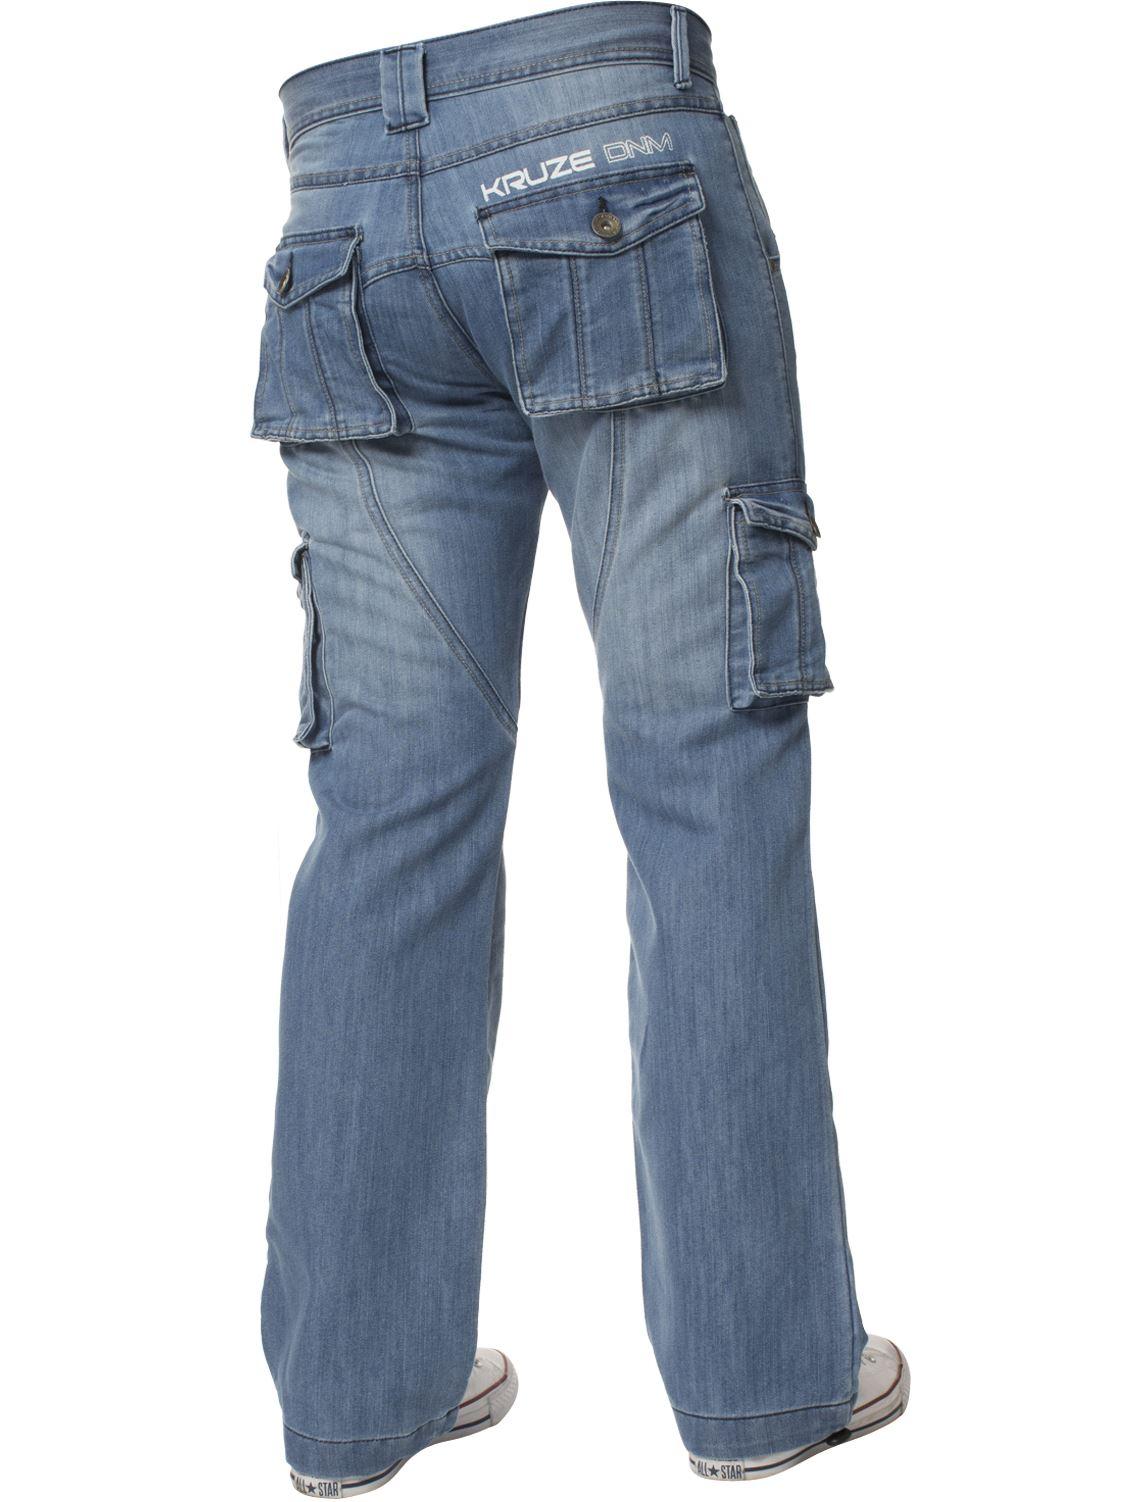 Mens-Jeans-Combate-Carga-Informal-Kruze-Trabajo-Pantalones-Cintura-Tallas-Denim-Pantalones-de-vestir miniatura 7